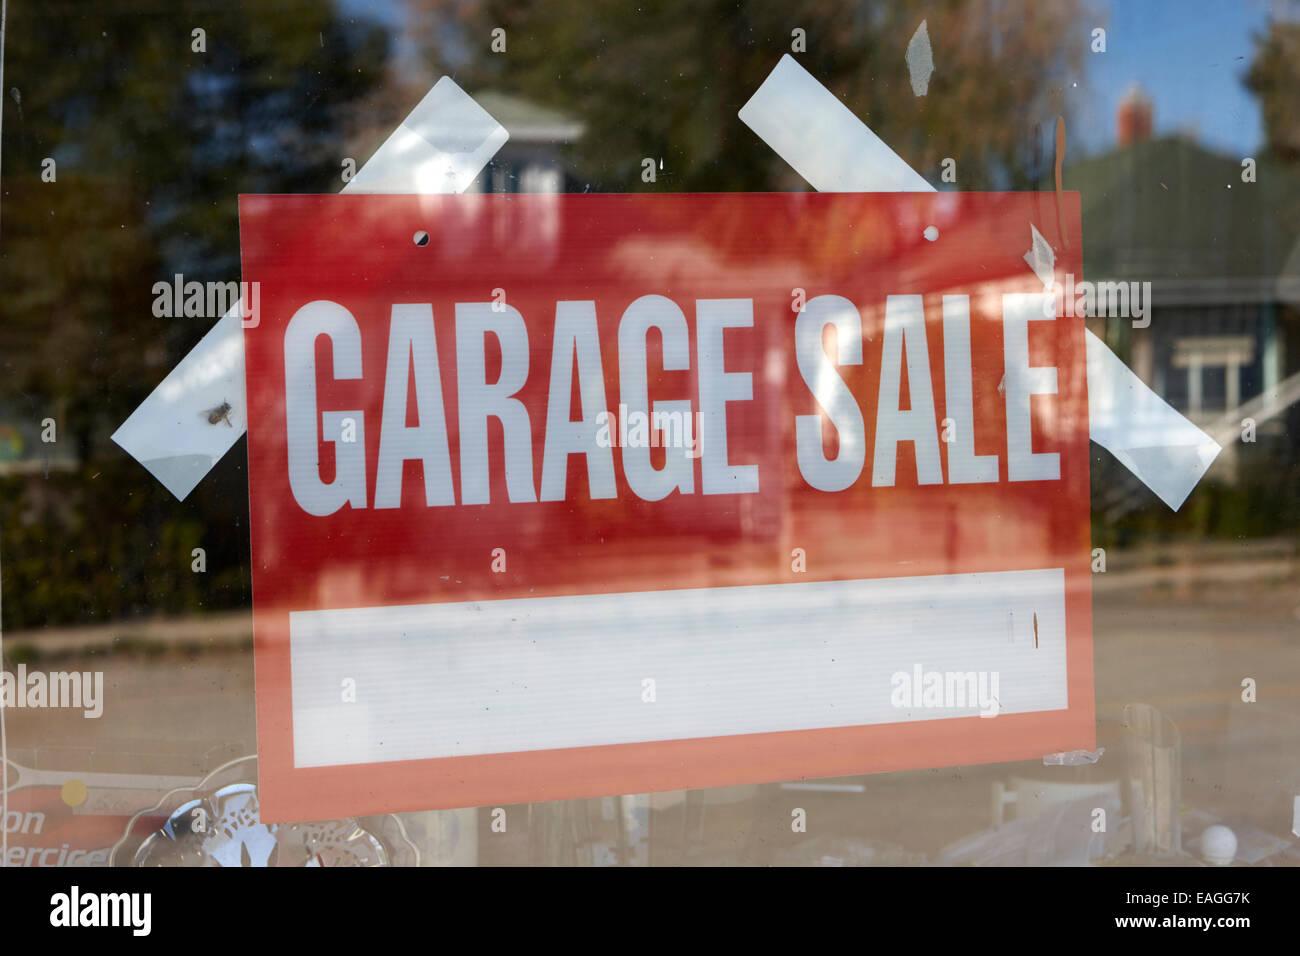 garage sale sign in a house window Saskatchewan Canada - Stock Image